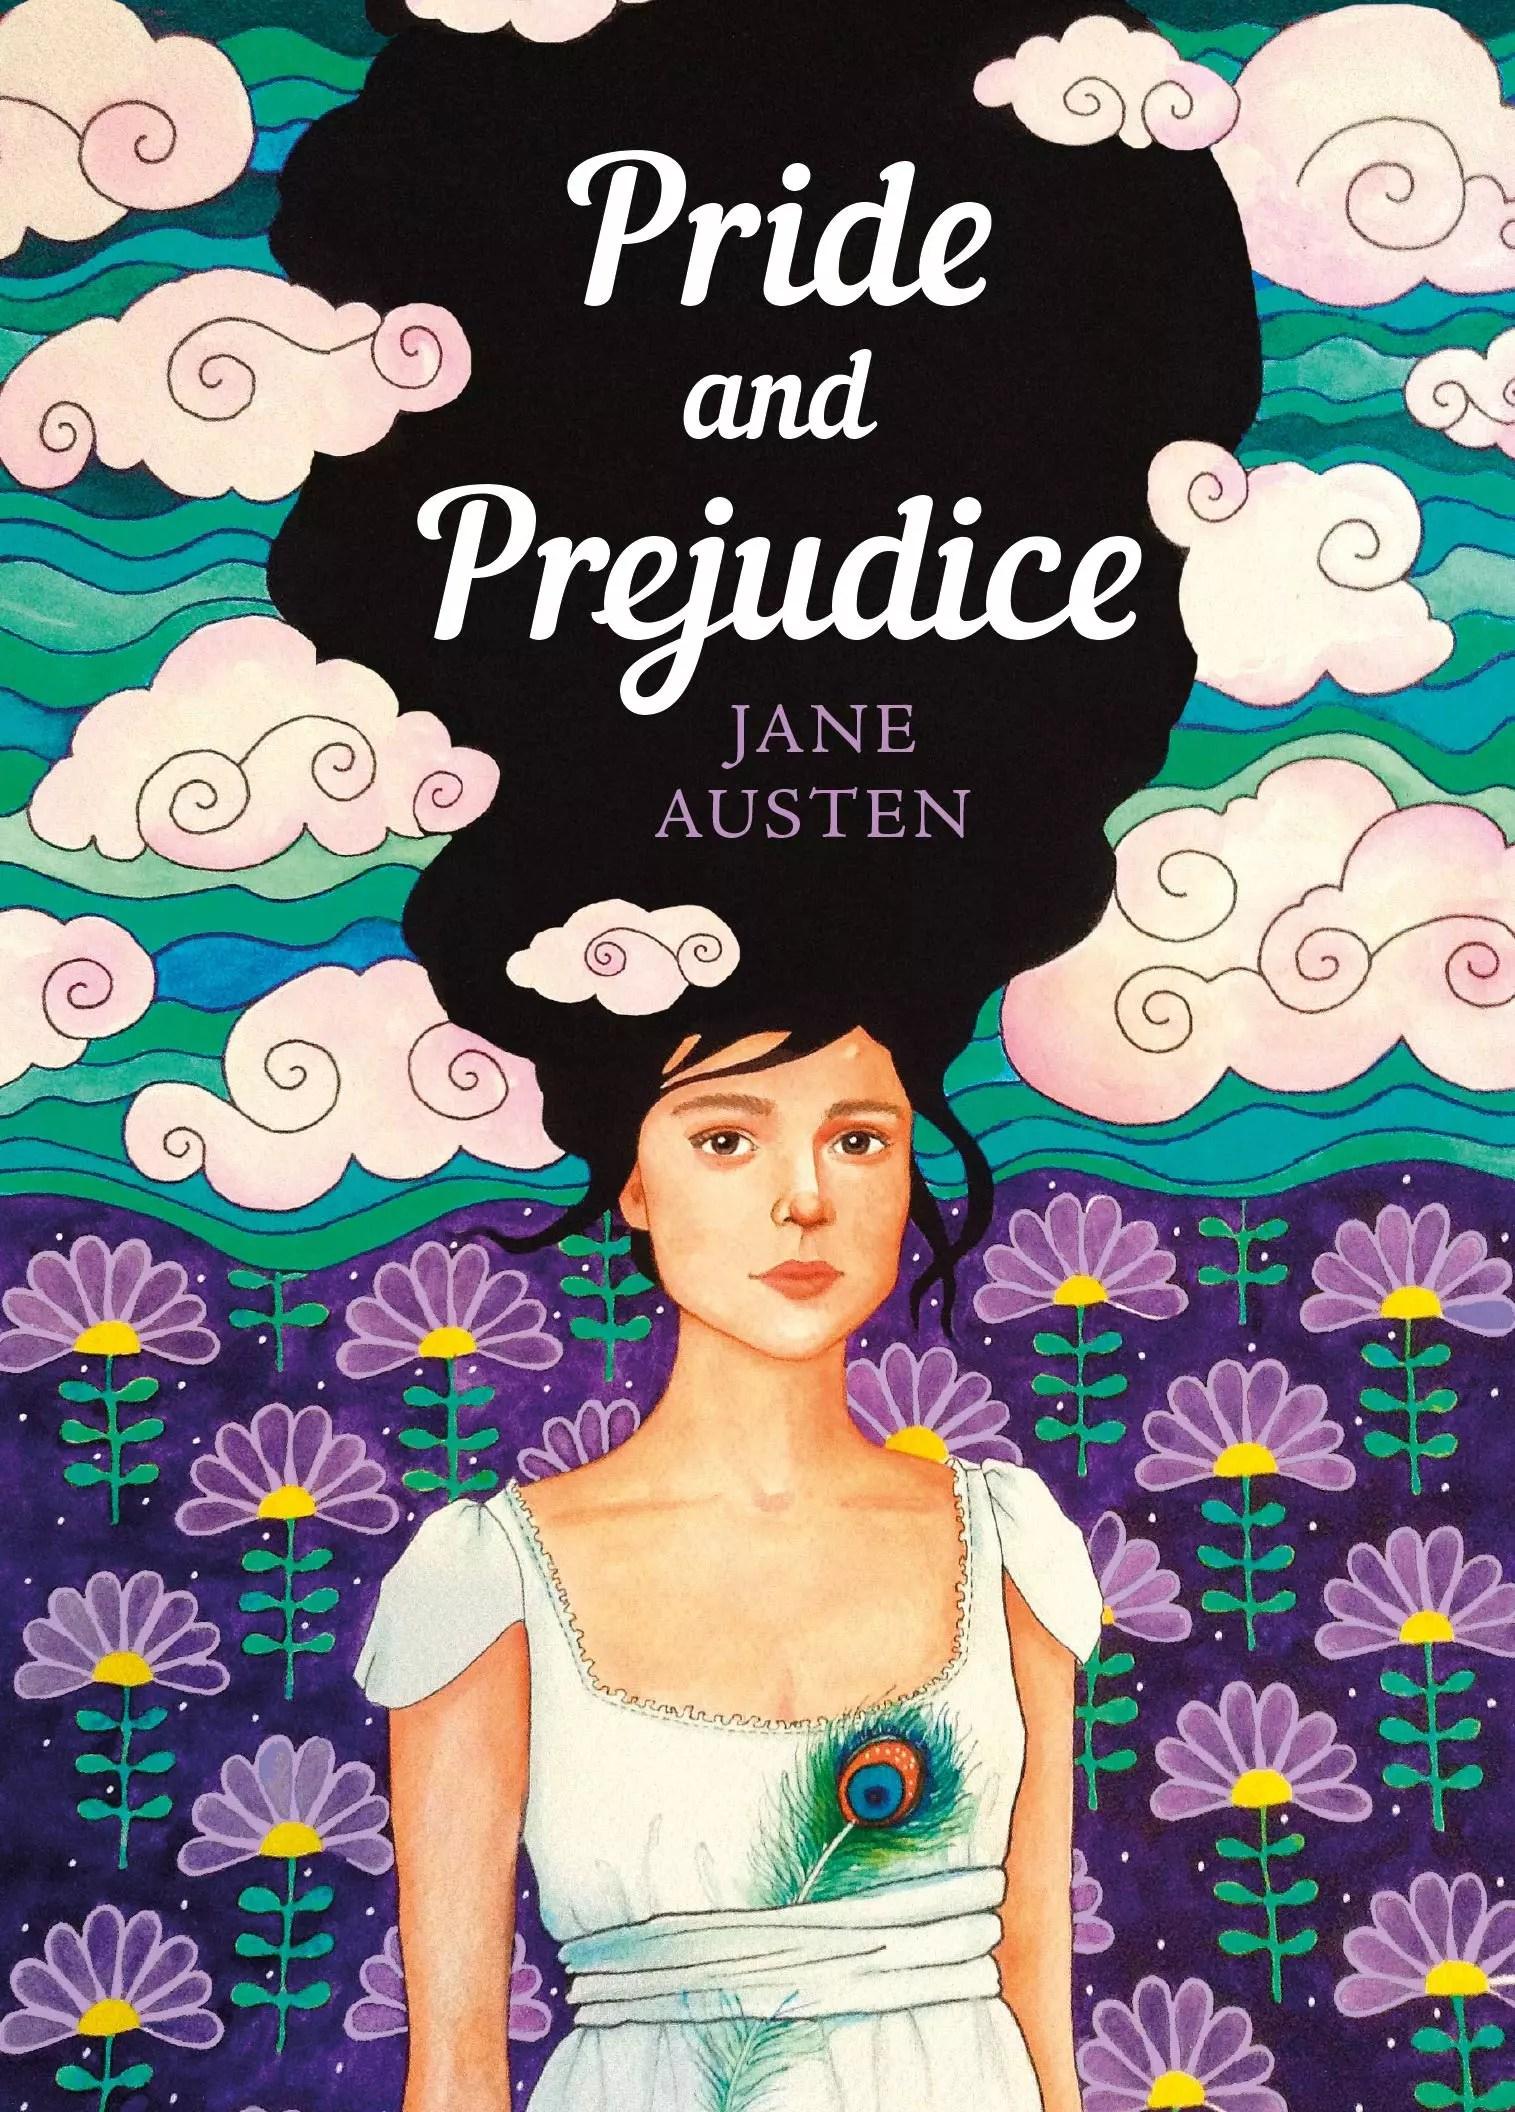 pride prejudice jane austen sisterhood collection